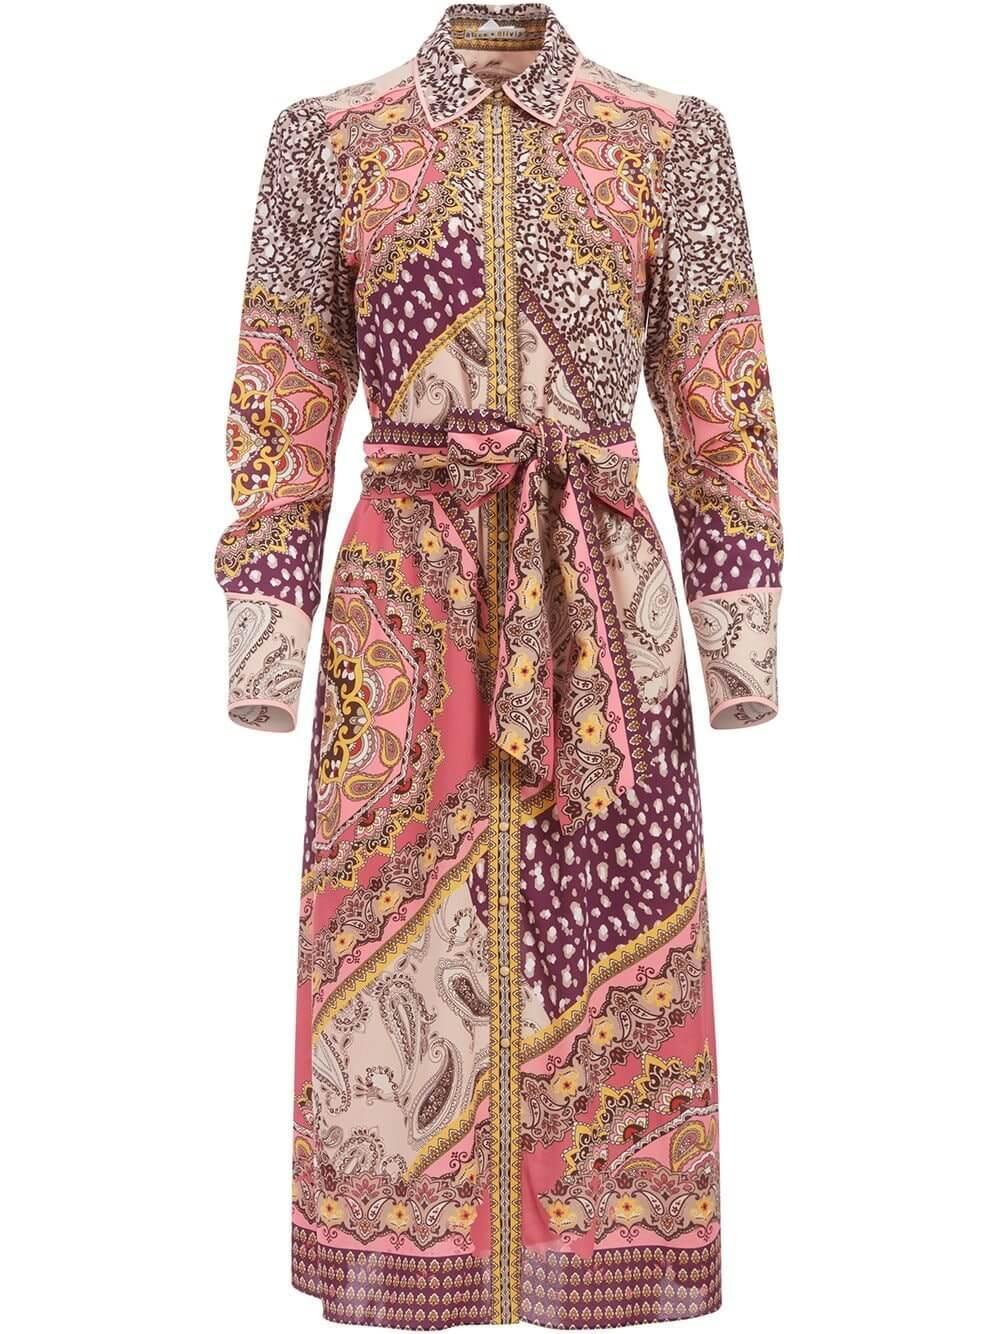 Luanne Shirt Dress Item # CC006P56509